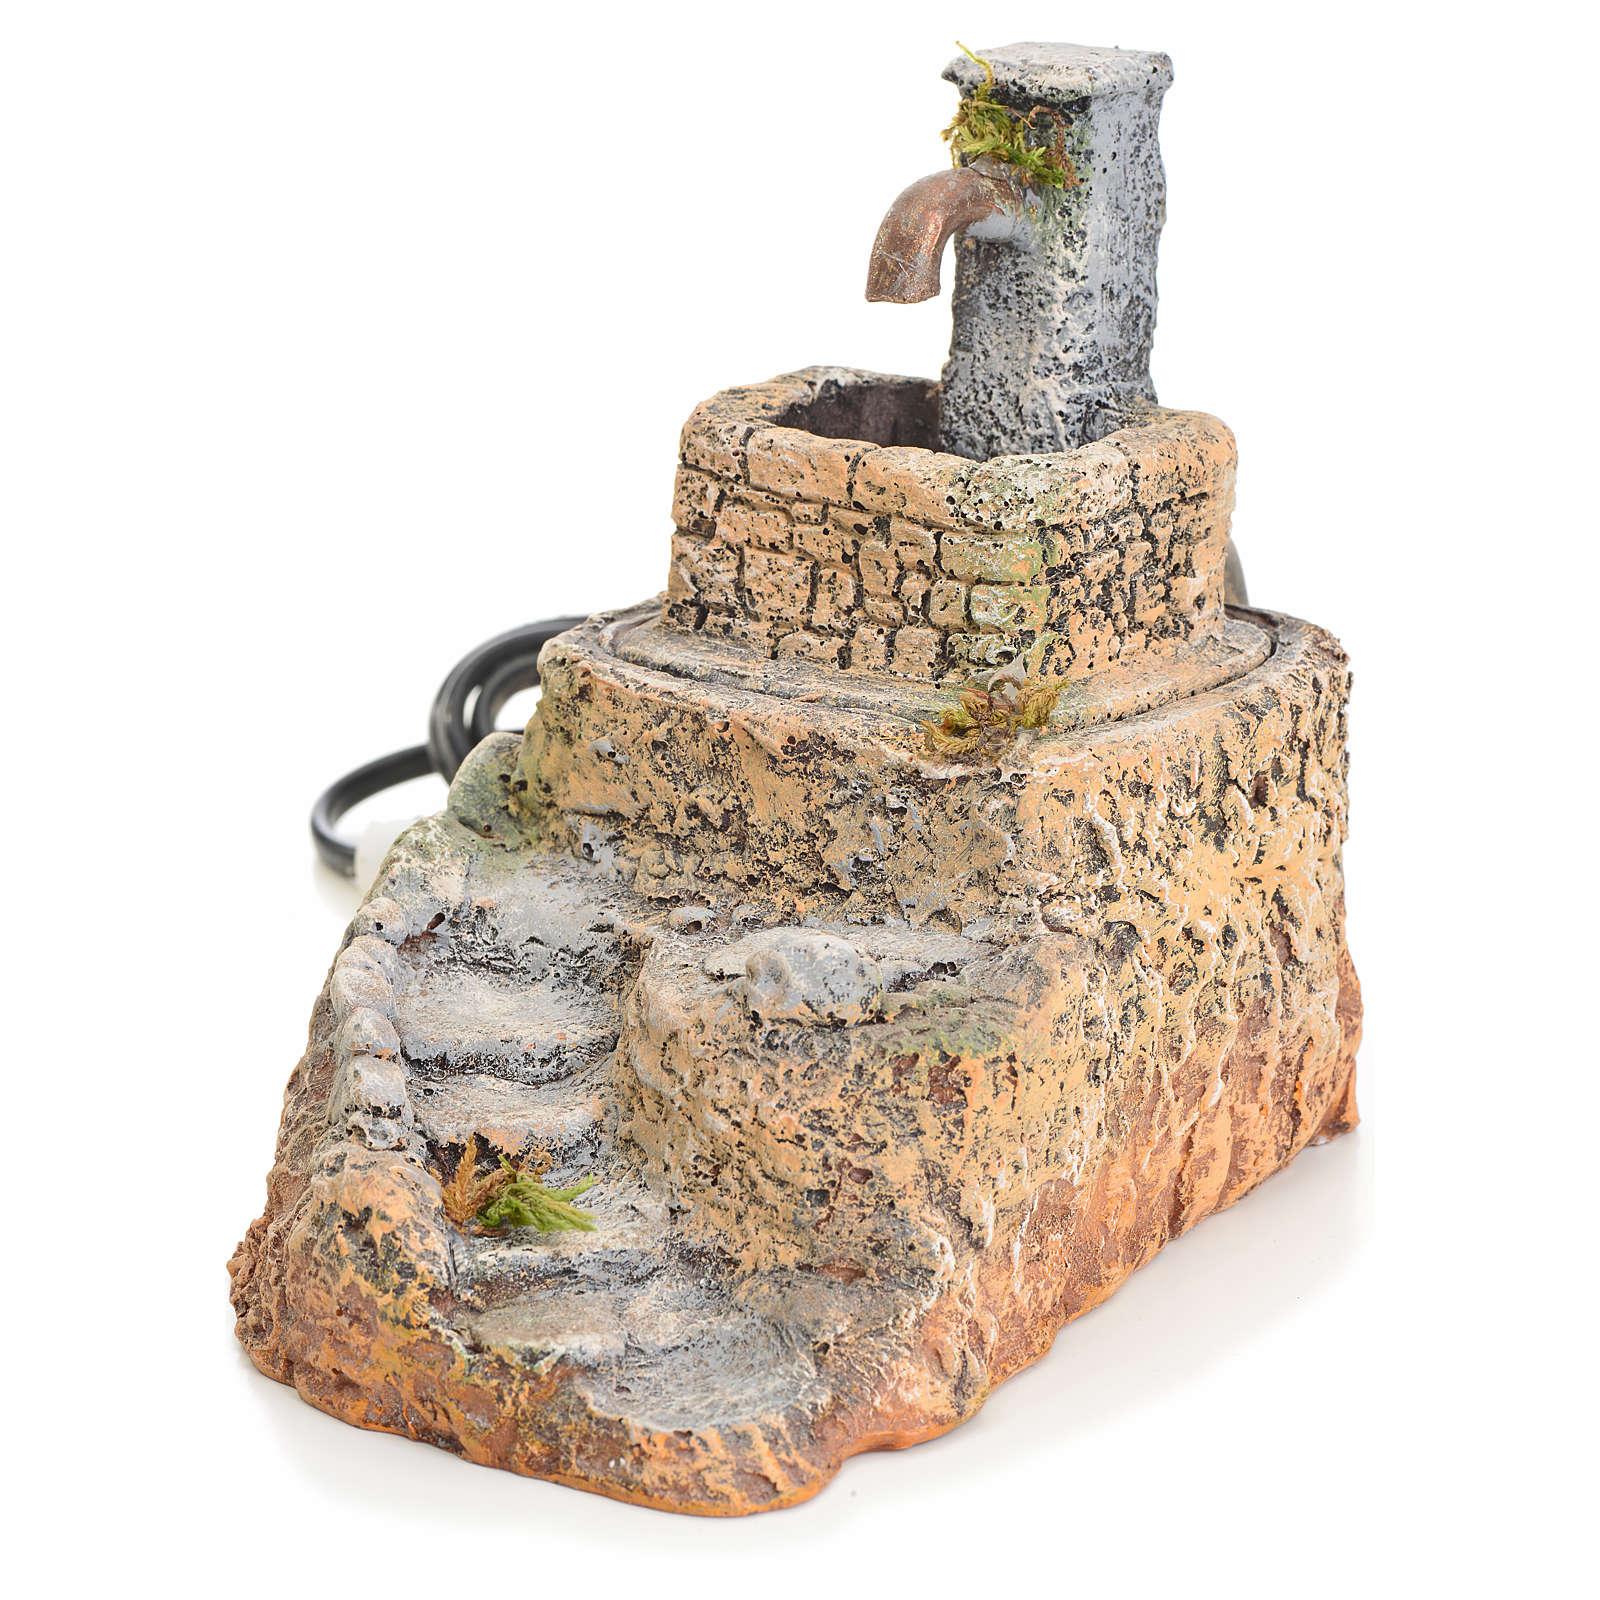 Fontana presepe resina con scaletta 13x10x15 cm 4